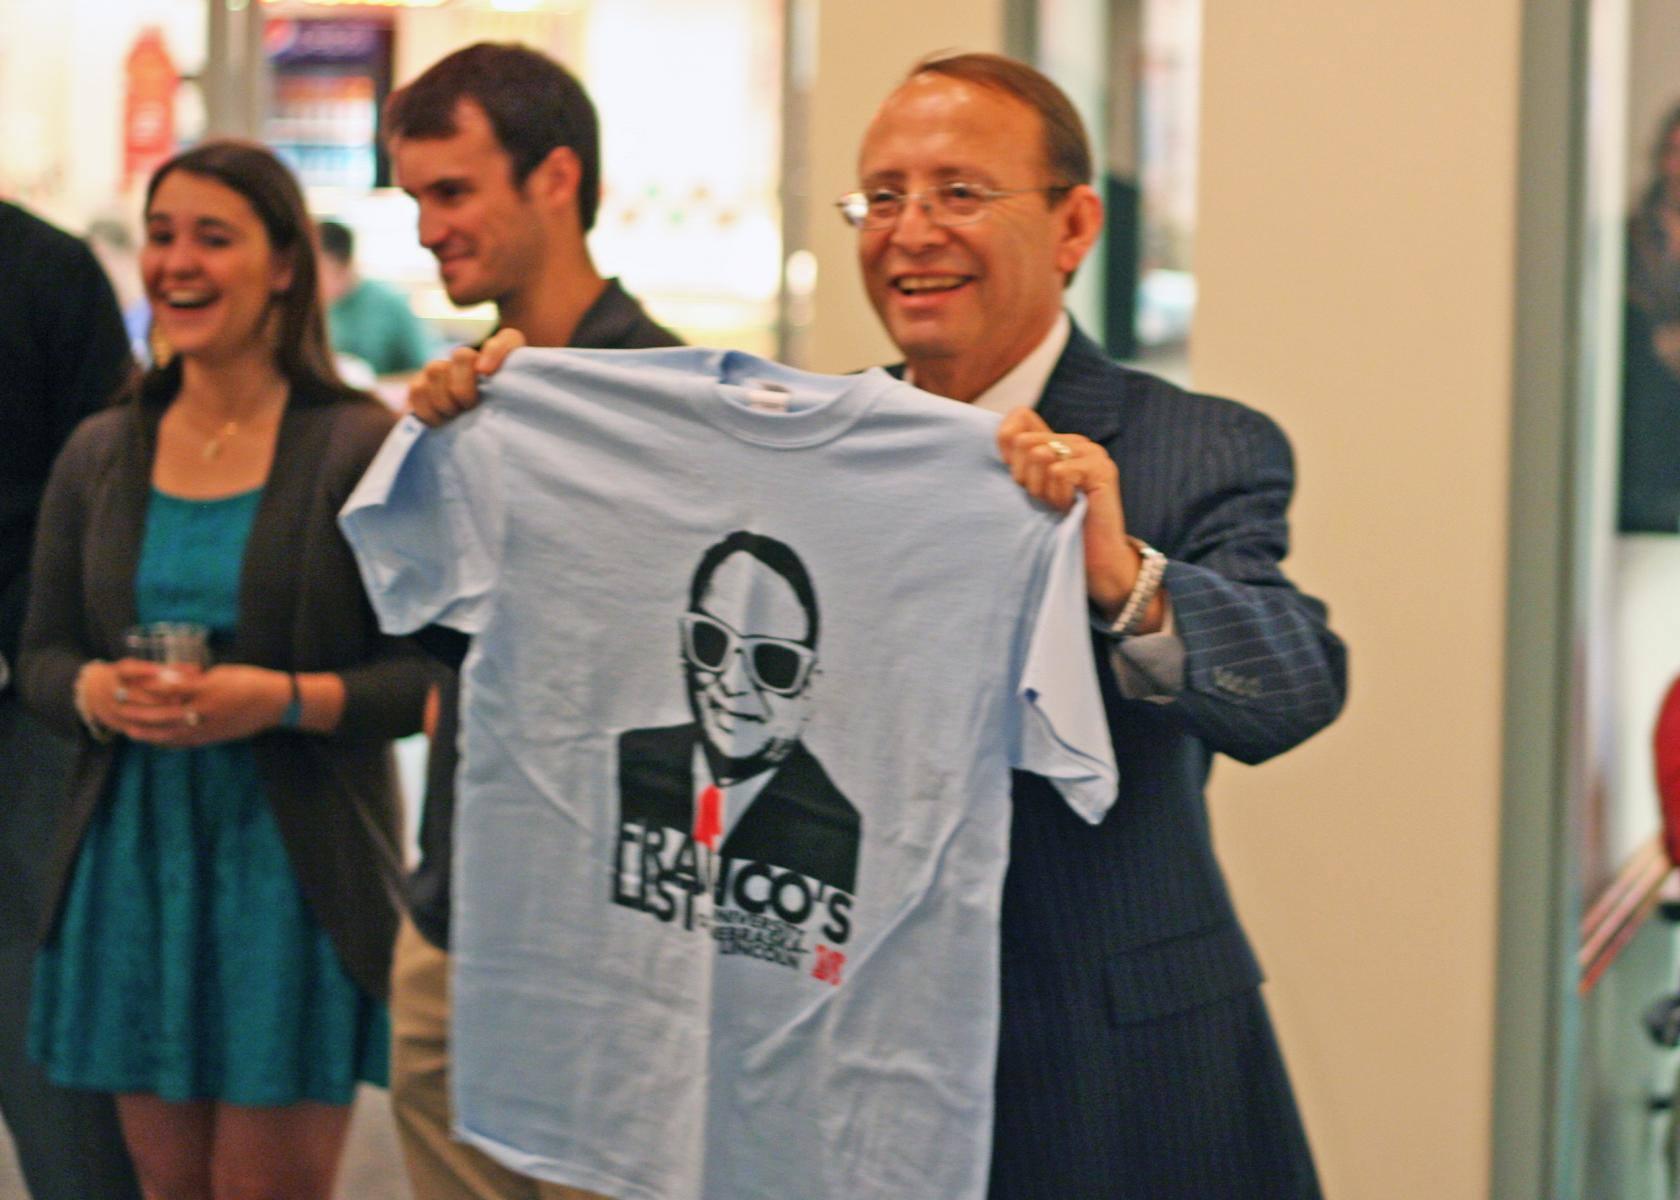 Dr. Franco awards Franco's List winners